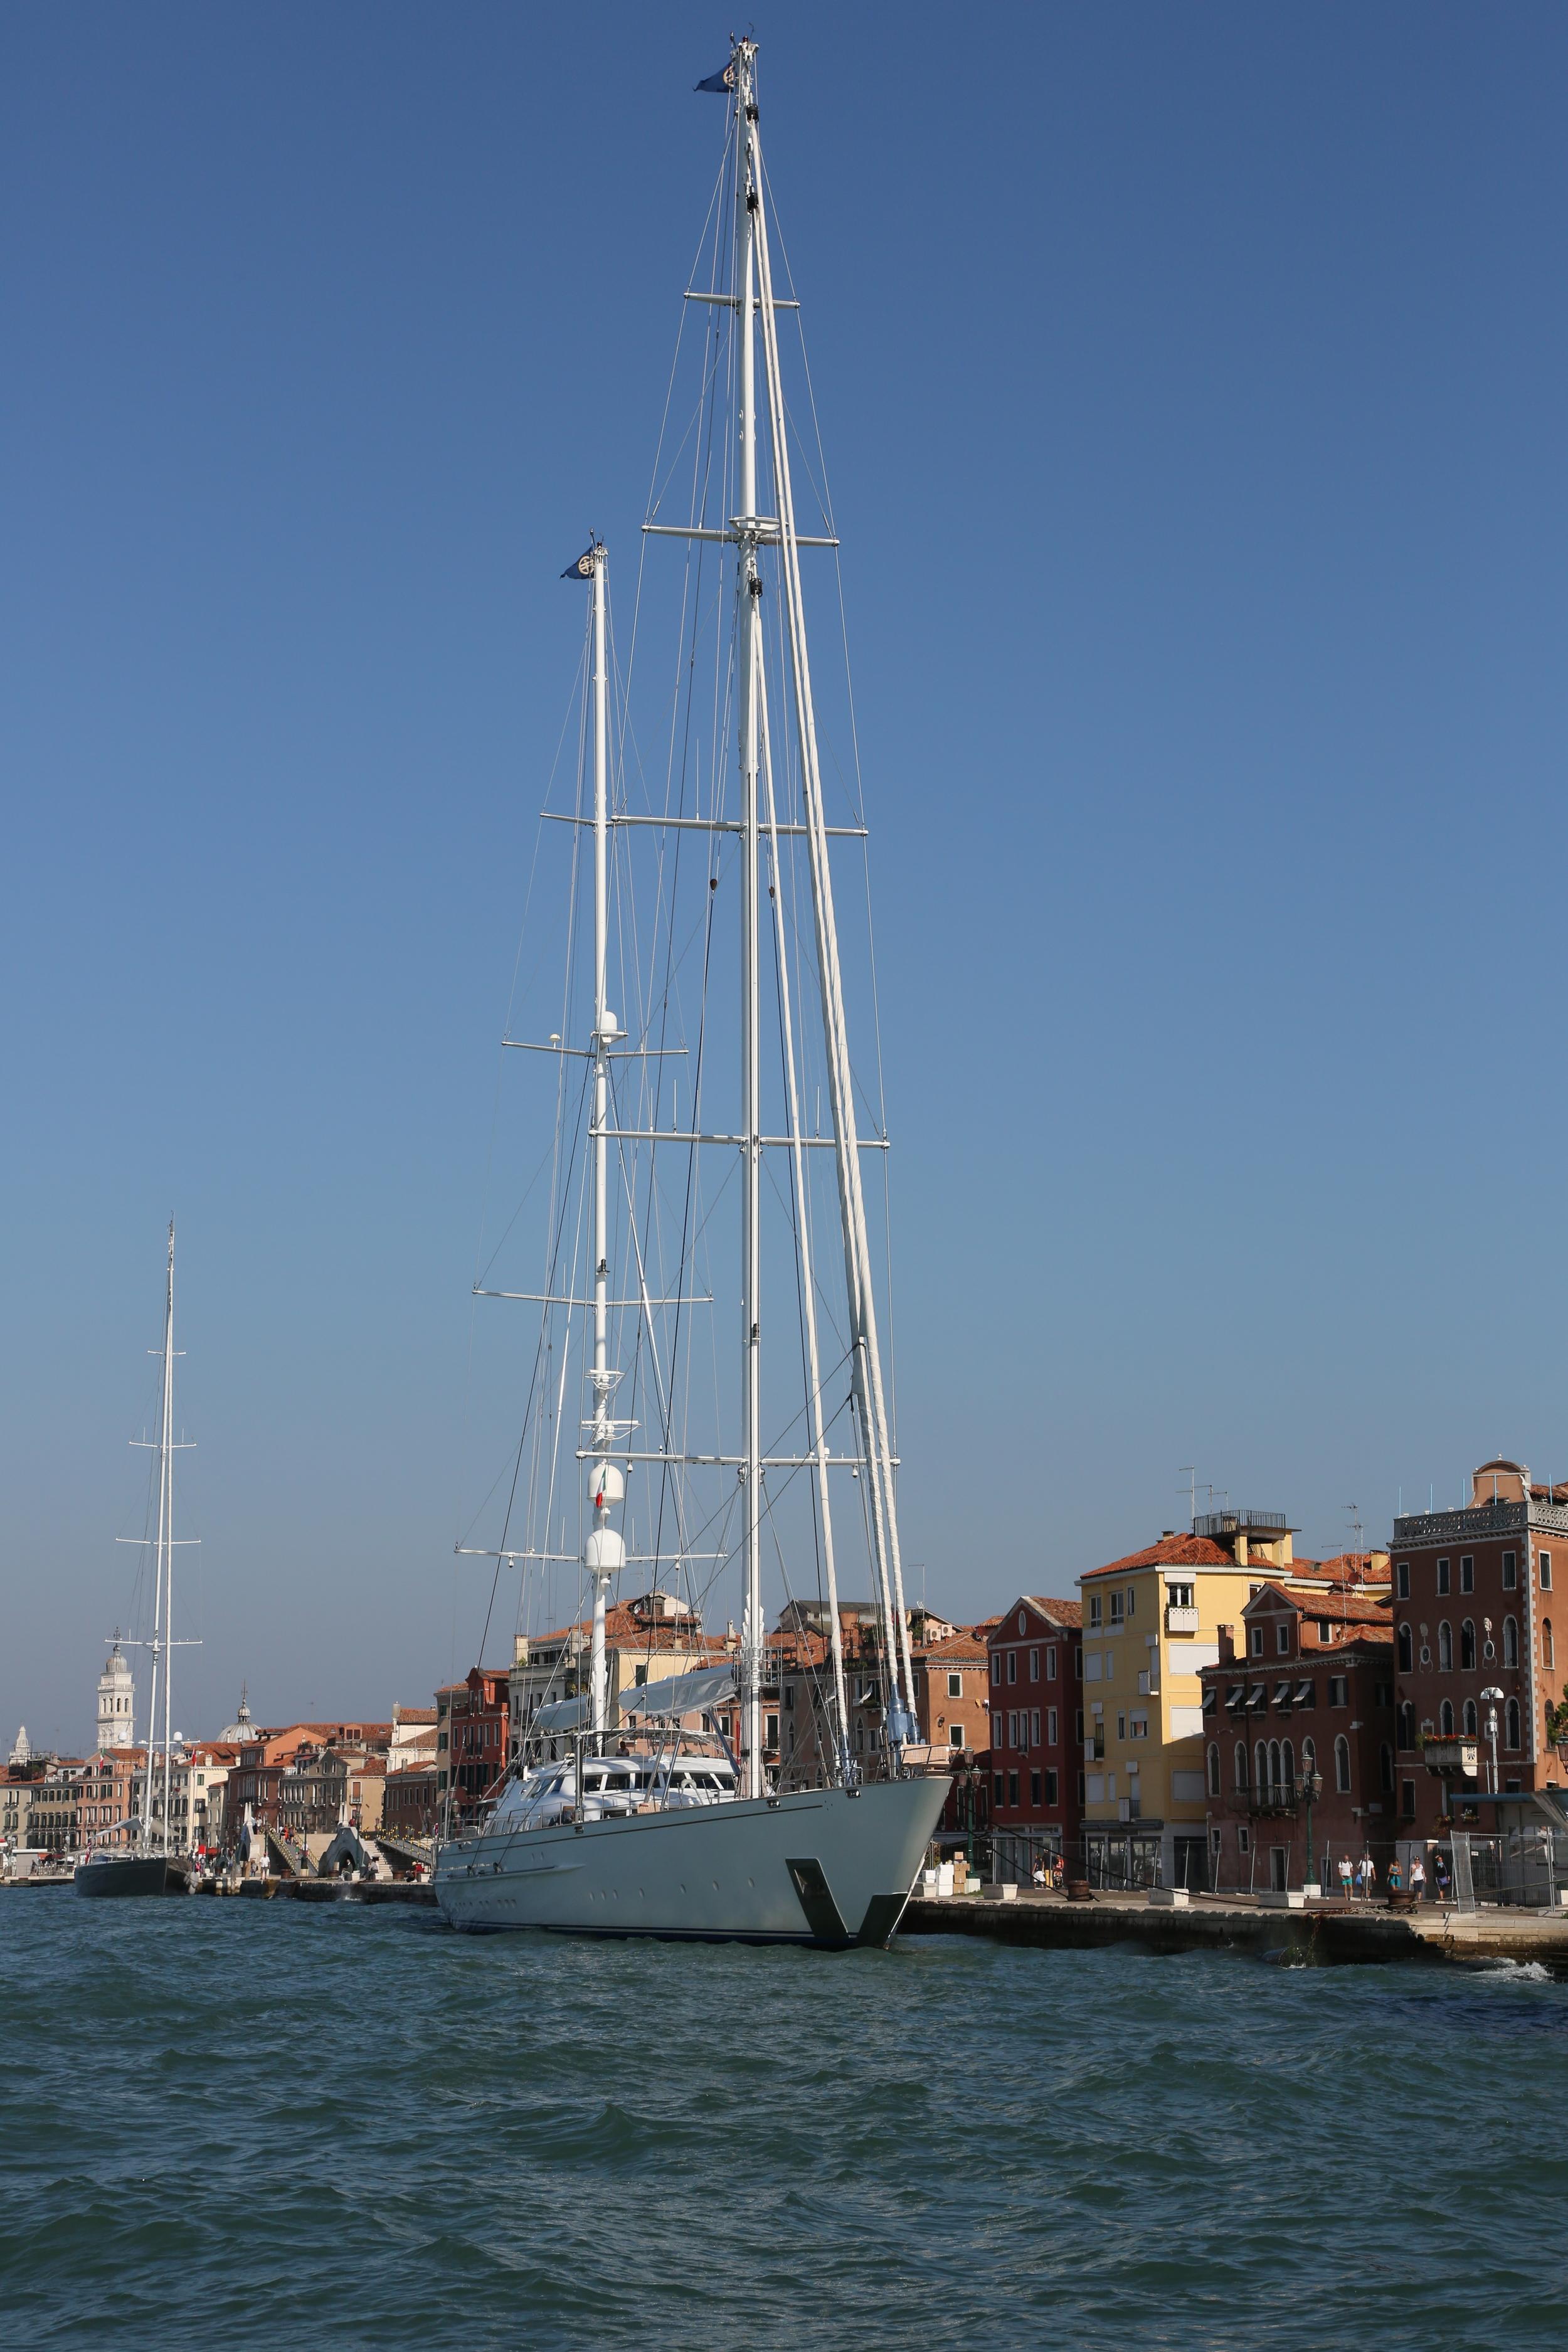 1209_Venise_0298.JPG